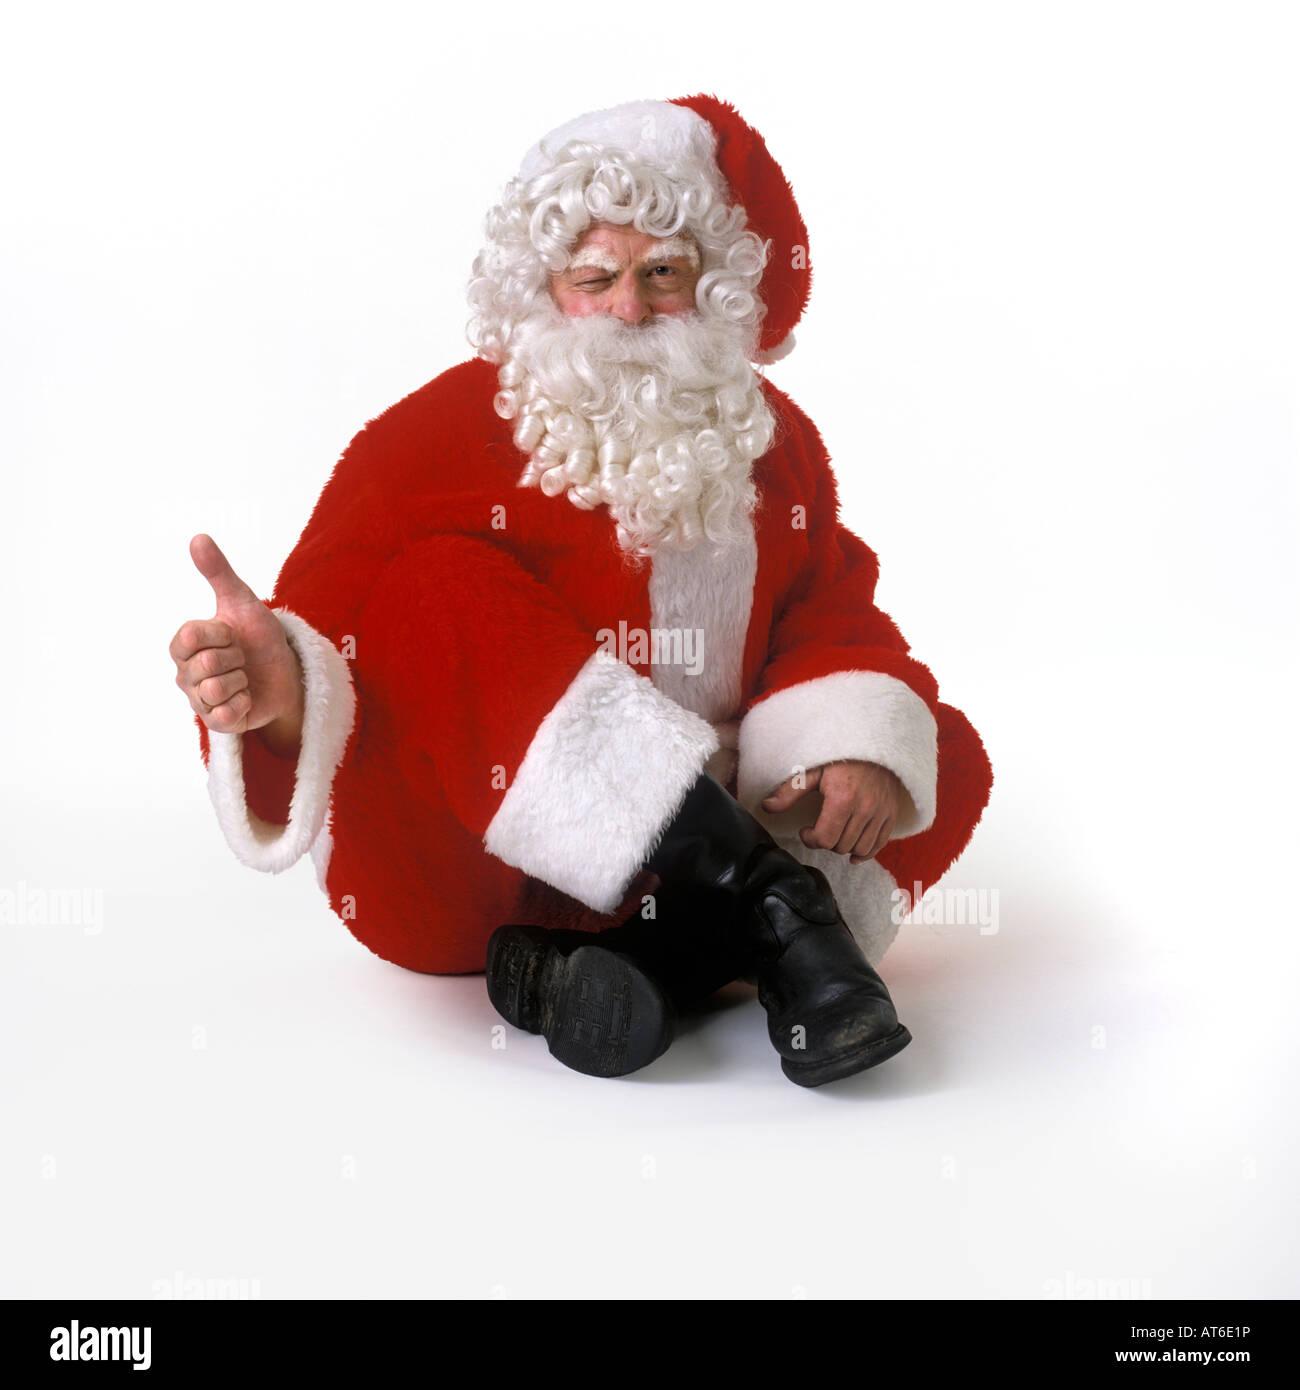 Santa Claus on white background - Stock Image